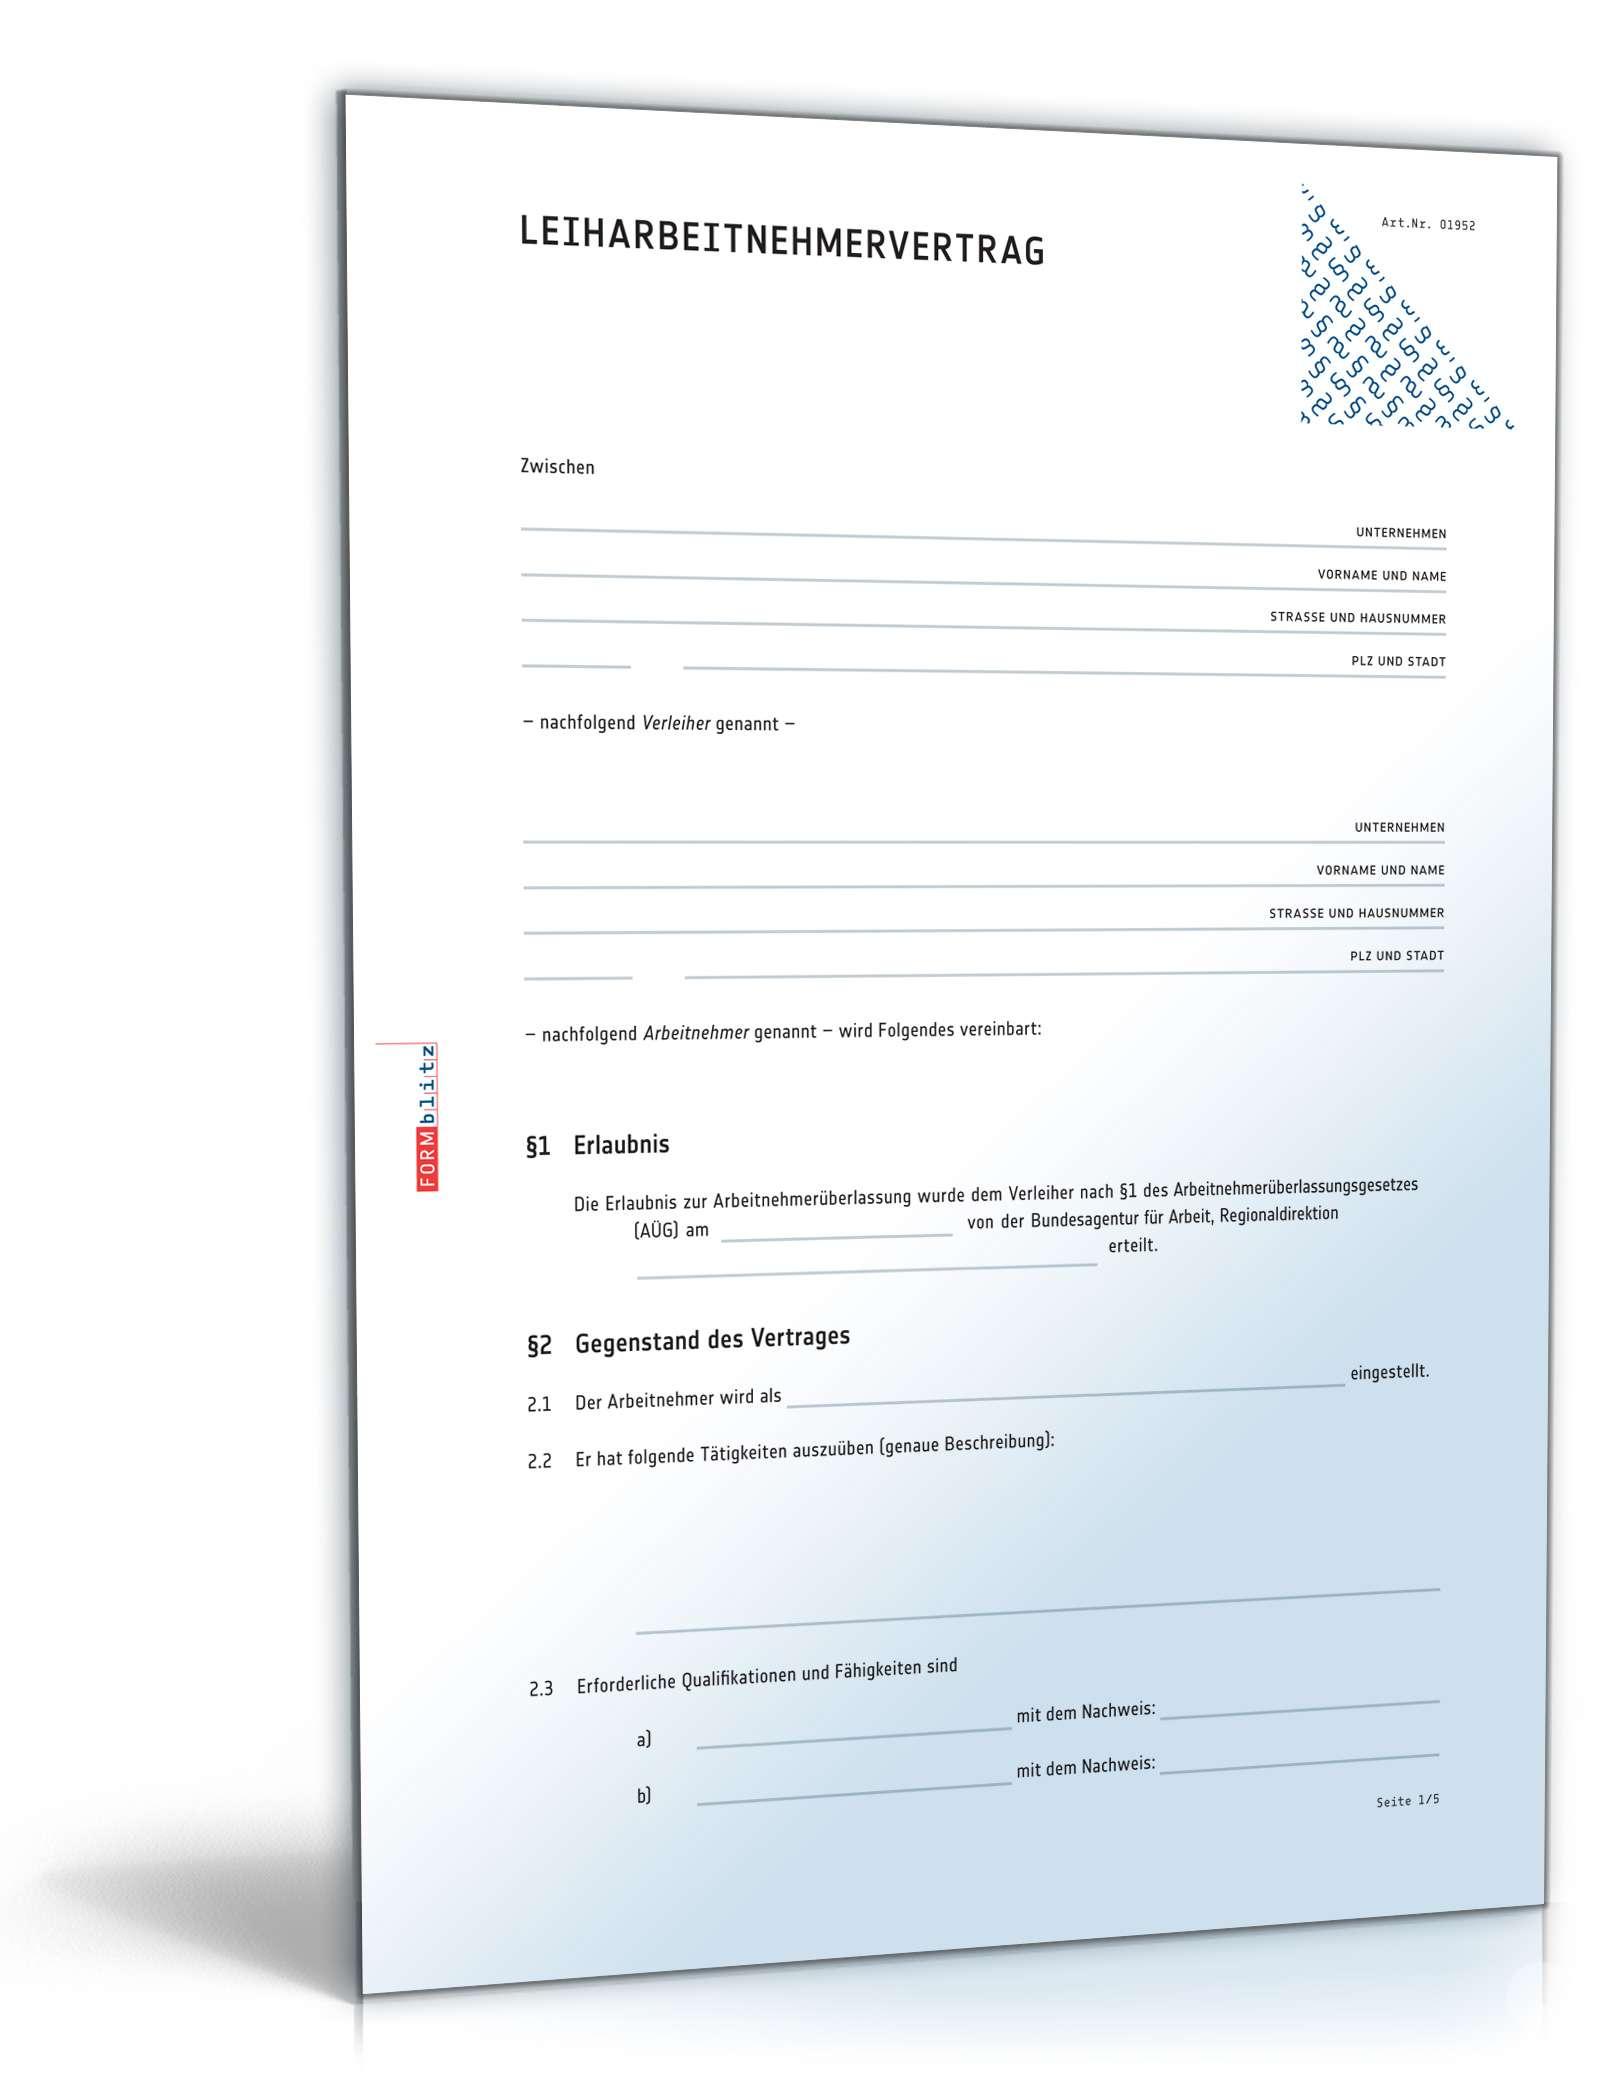 Leiharbeitsvertrag Rechtssicheres Muster Zum Download